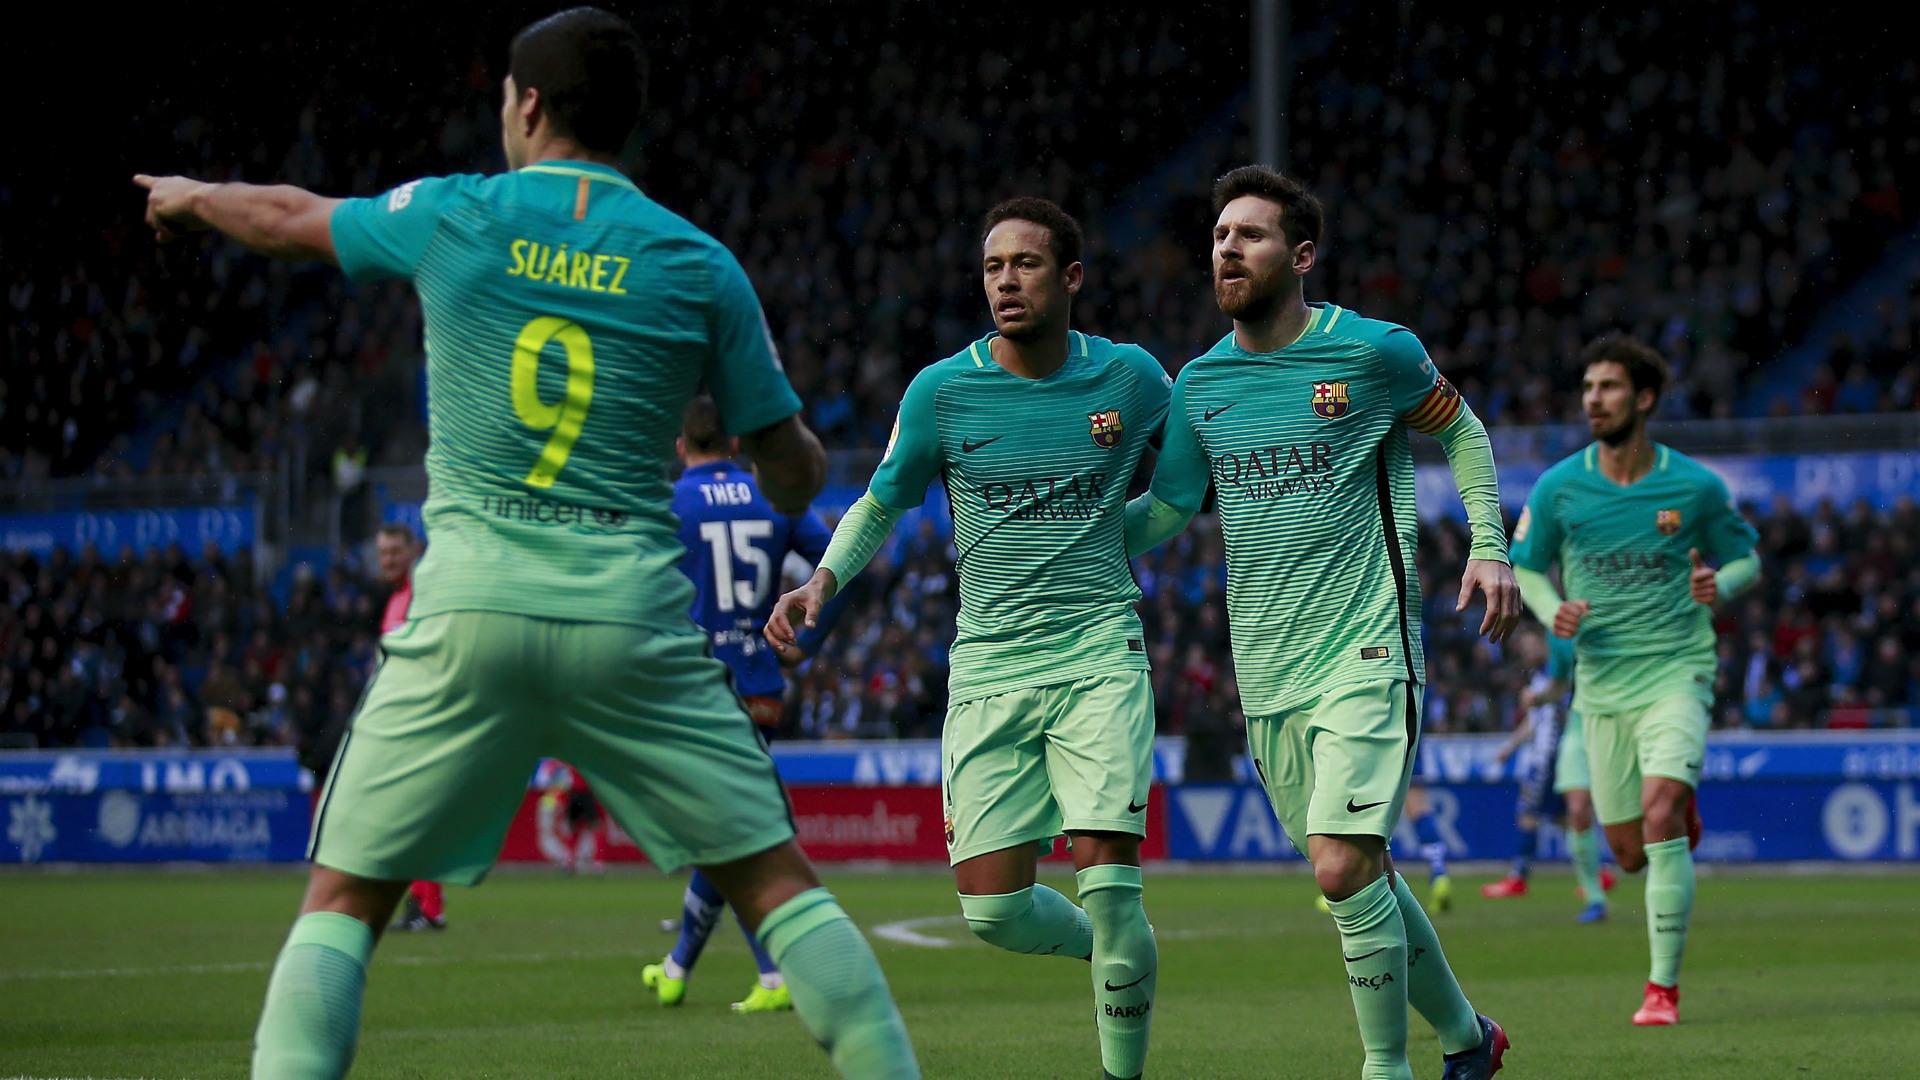 Luis Suarez Neymar Messi Alaves Barcelona LaLiga 11020217